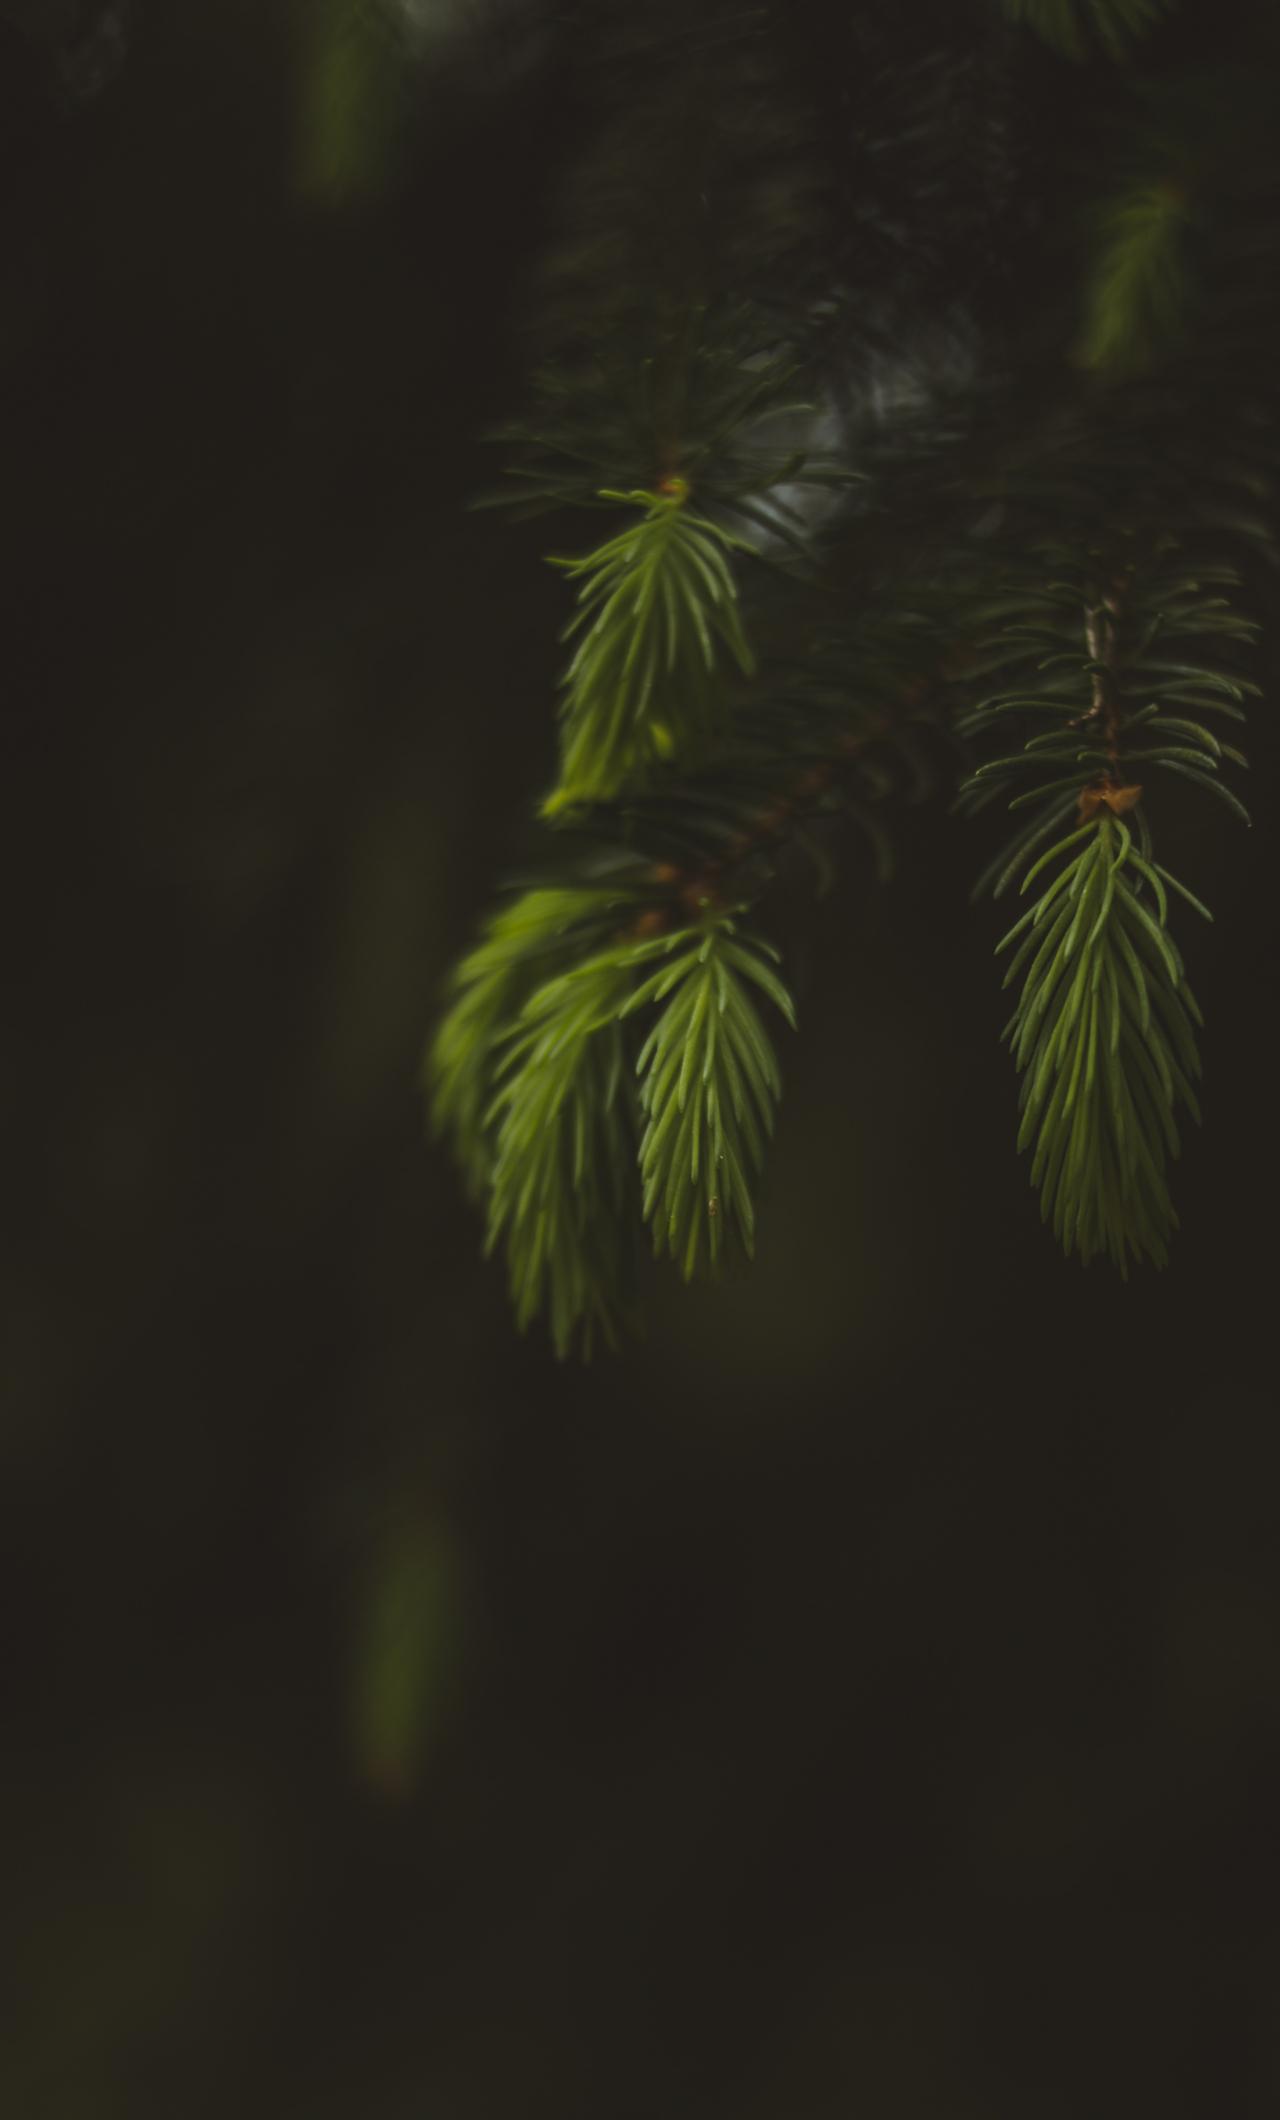 Blur, portrait, leaf, fern, 1280x2120 wallpaper